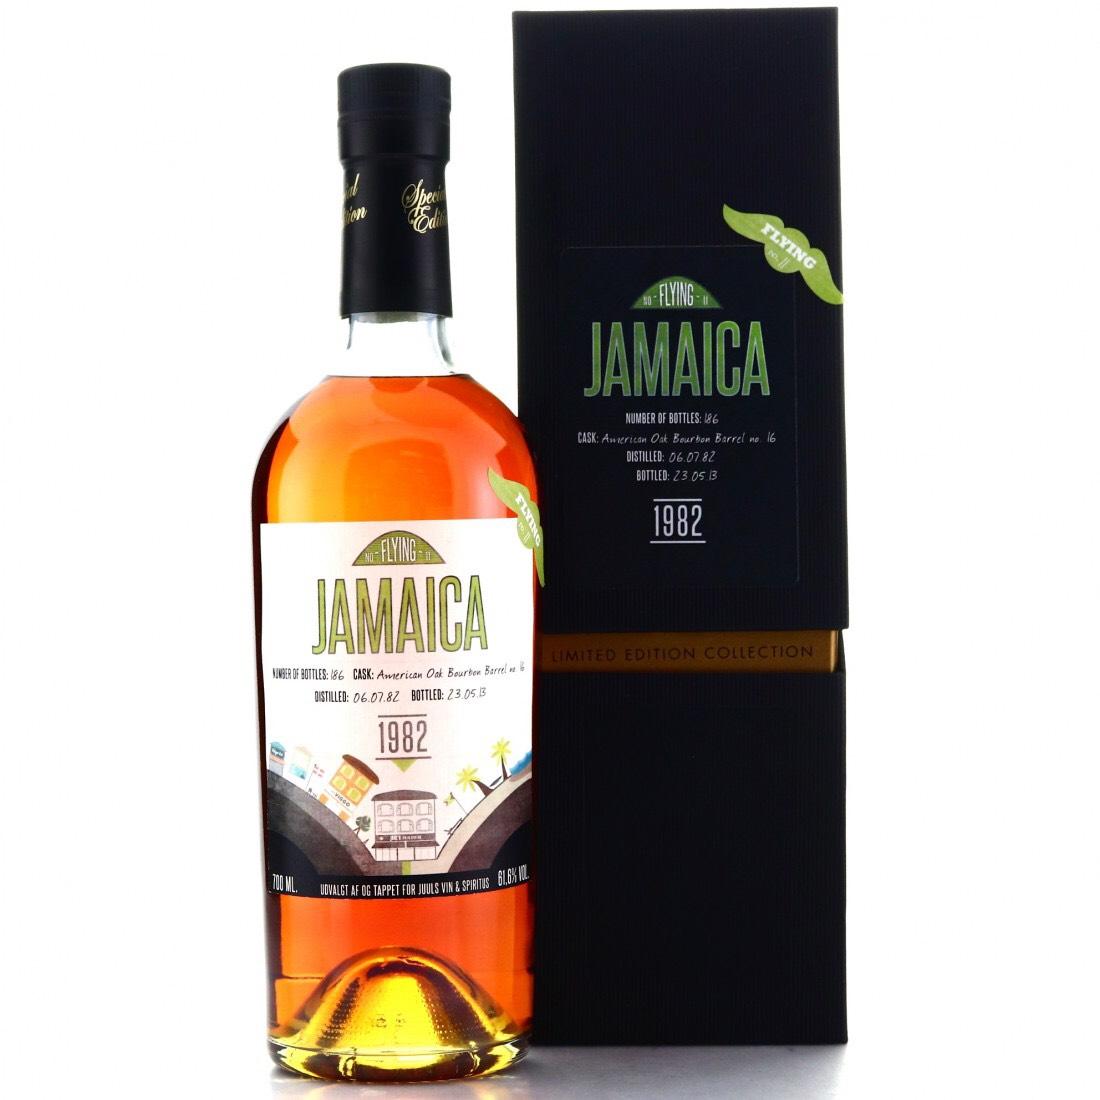 Bottle image of Jamaica Flying No. 11